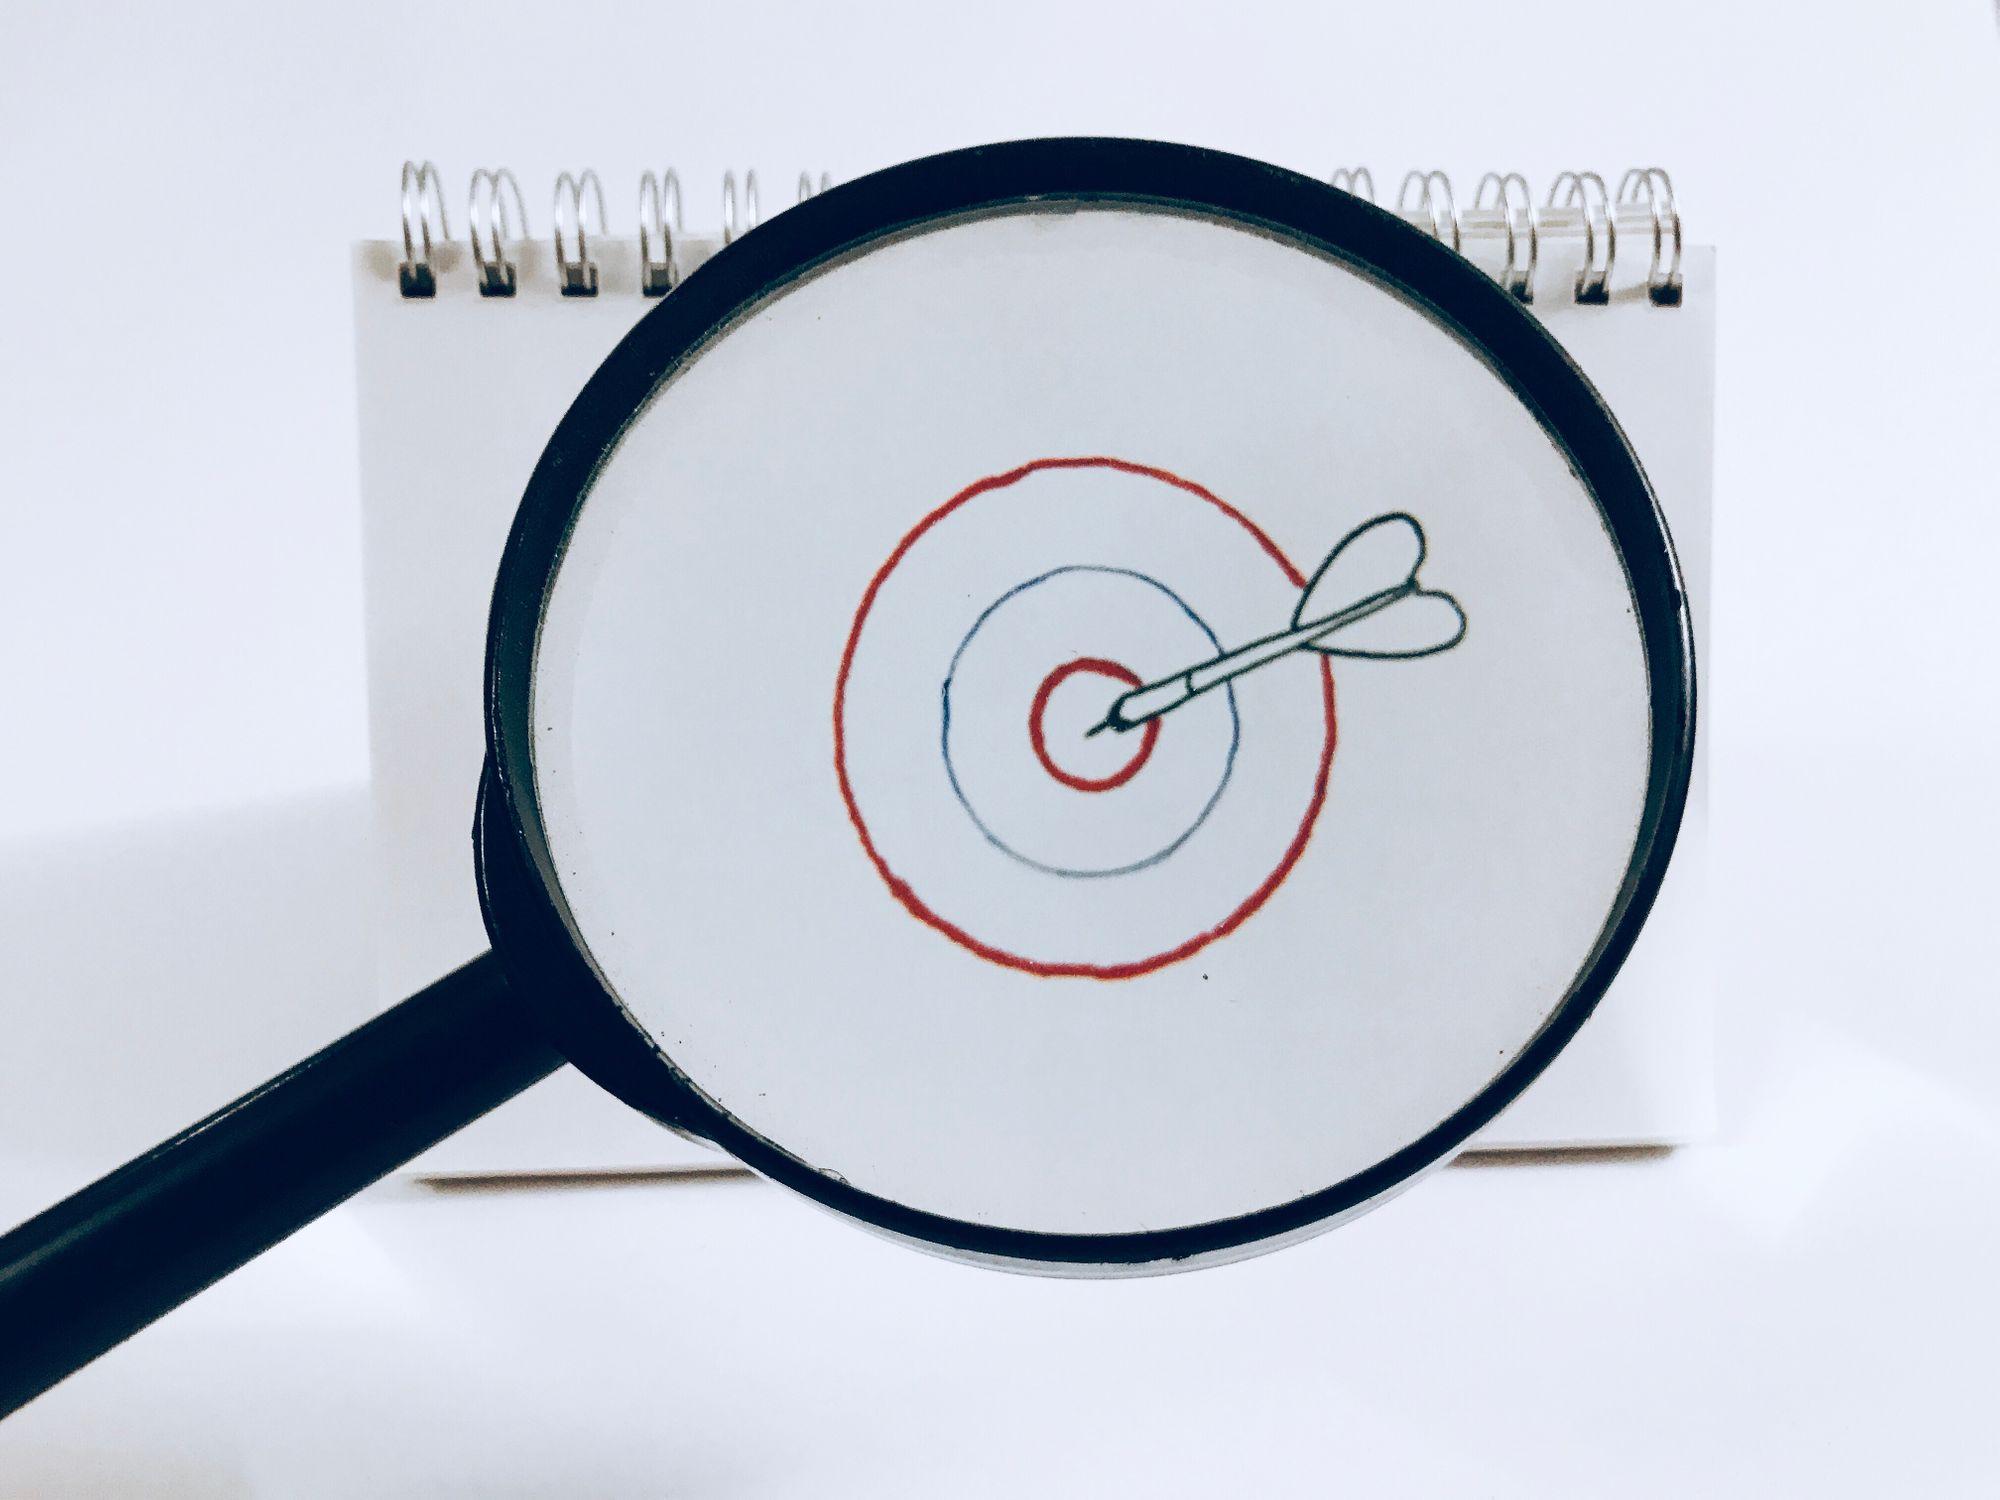 Targeting-users